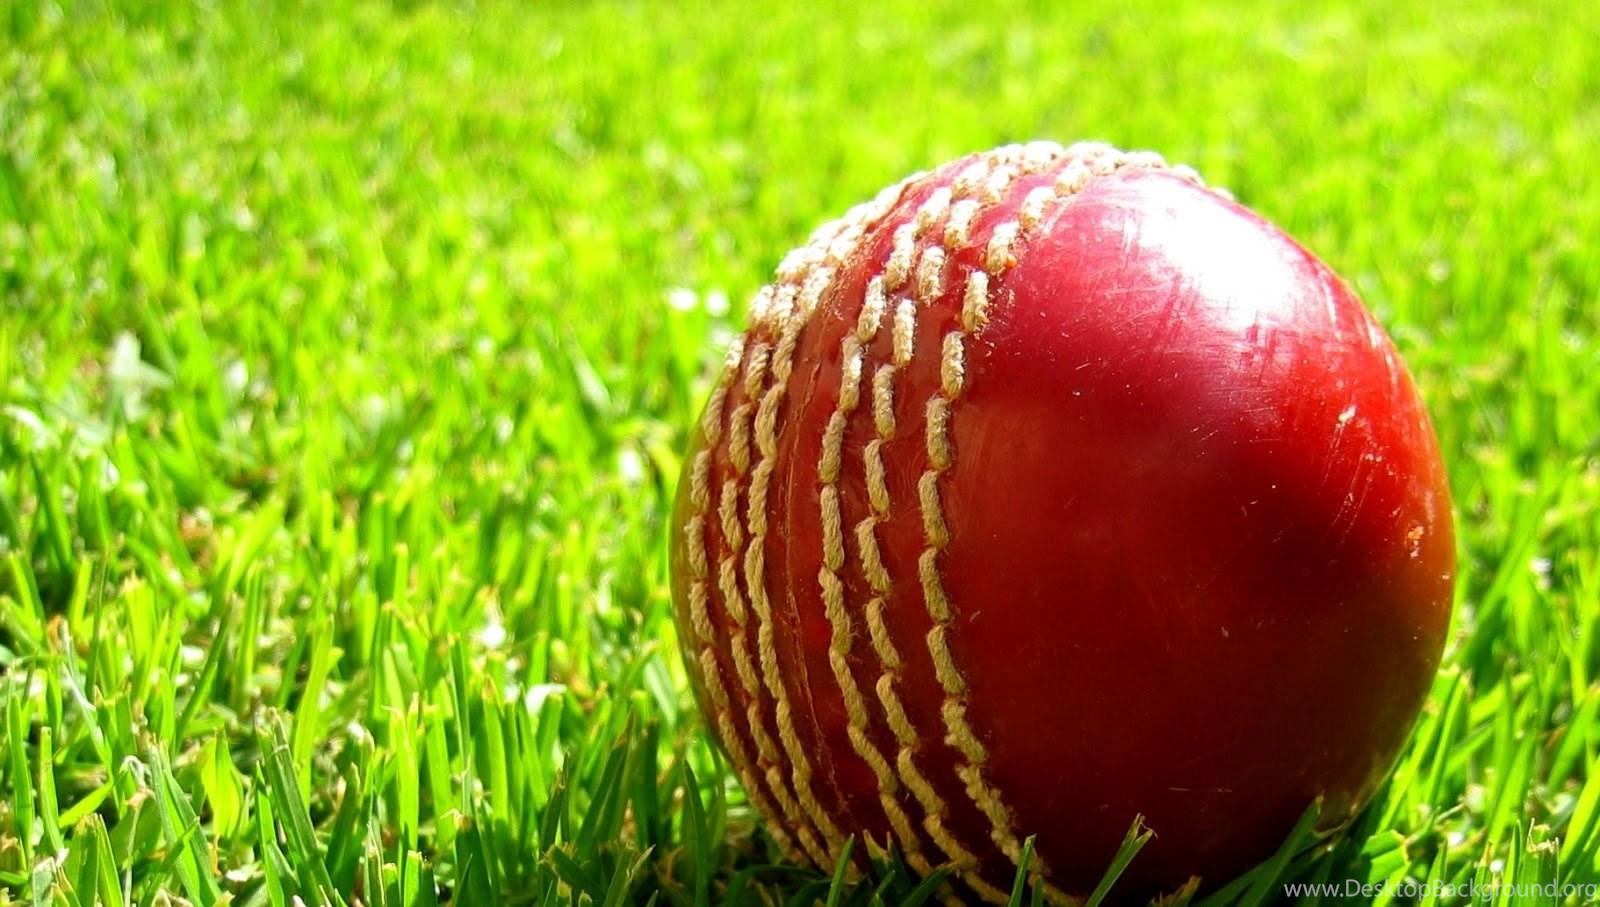 Free download pakistan cricket hd wallpapers for desktop desktop background - Pakistan cricket wallpapers hd ...